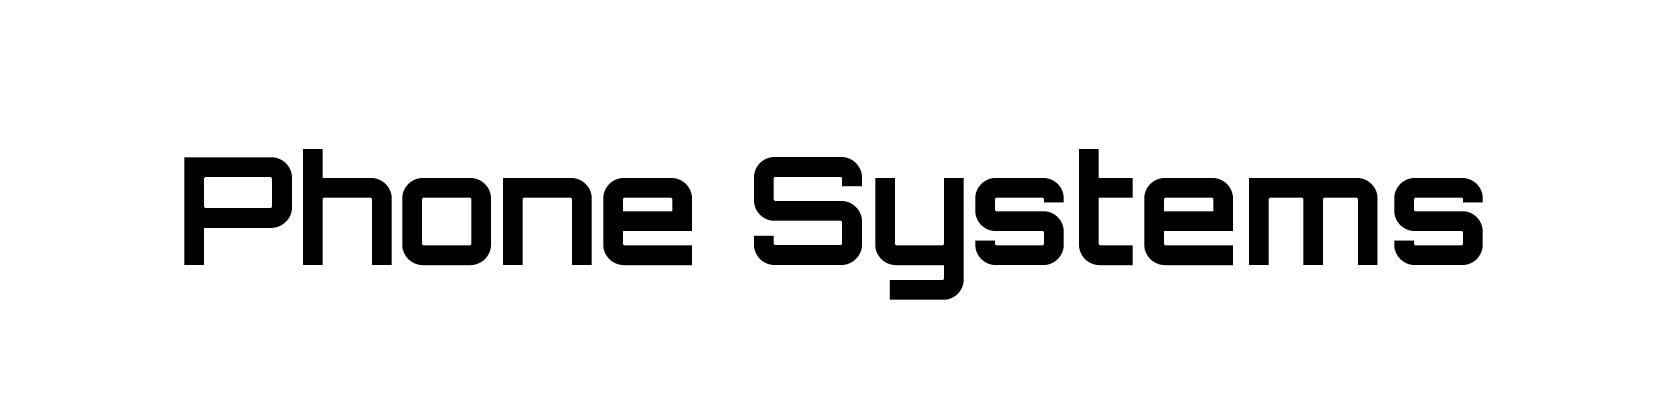 Phone Systems.jpg